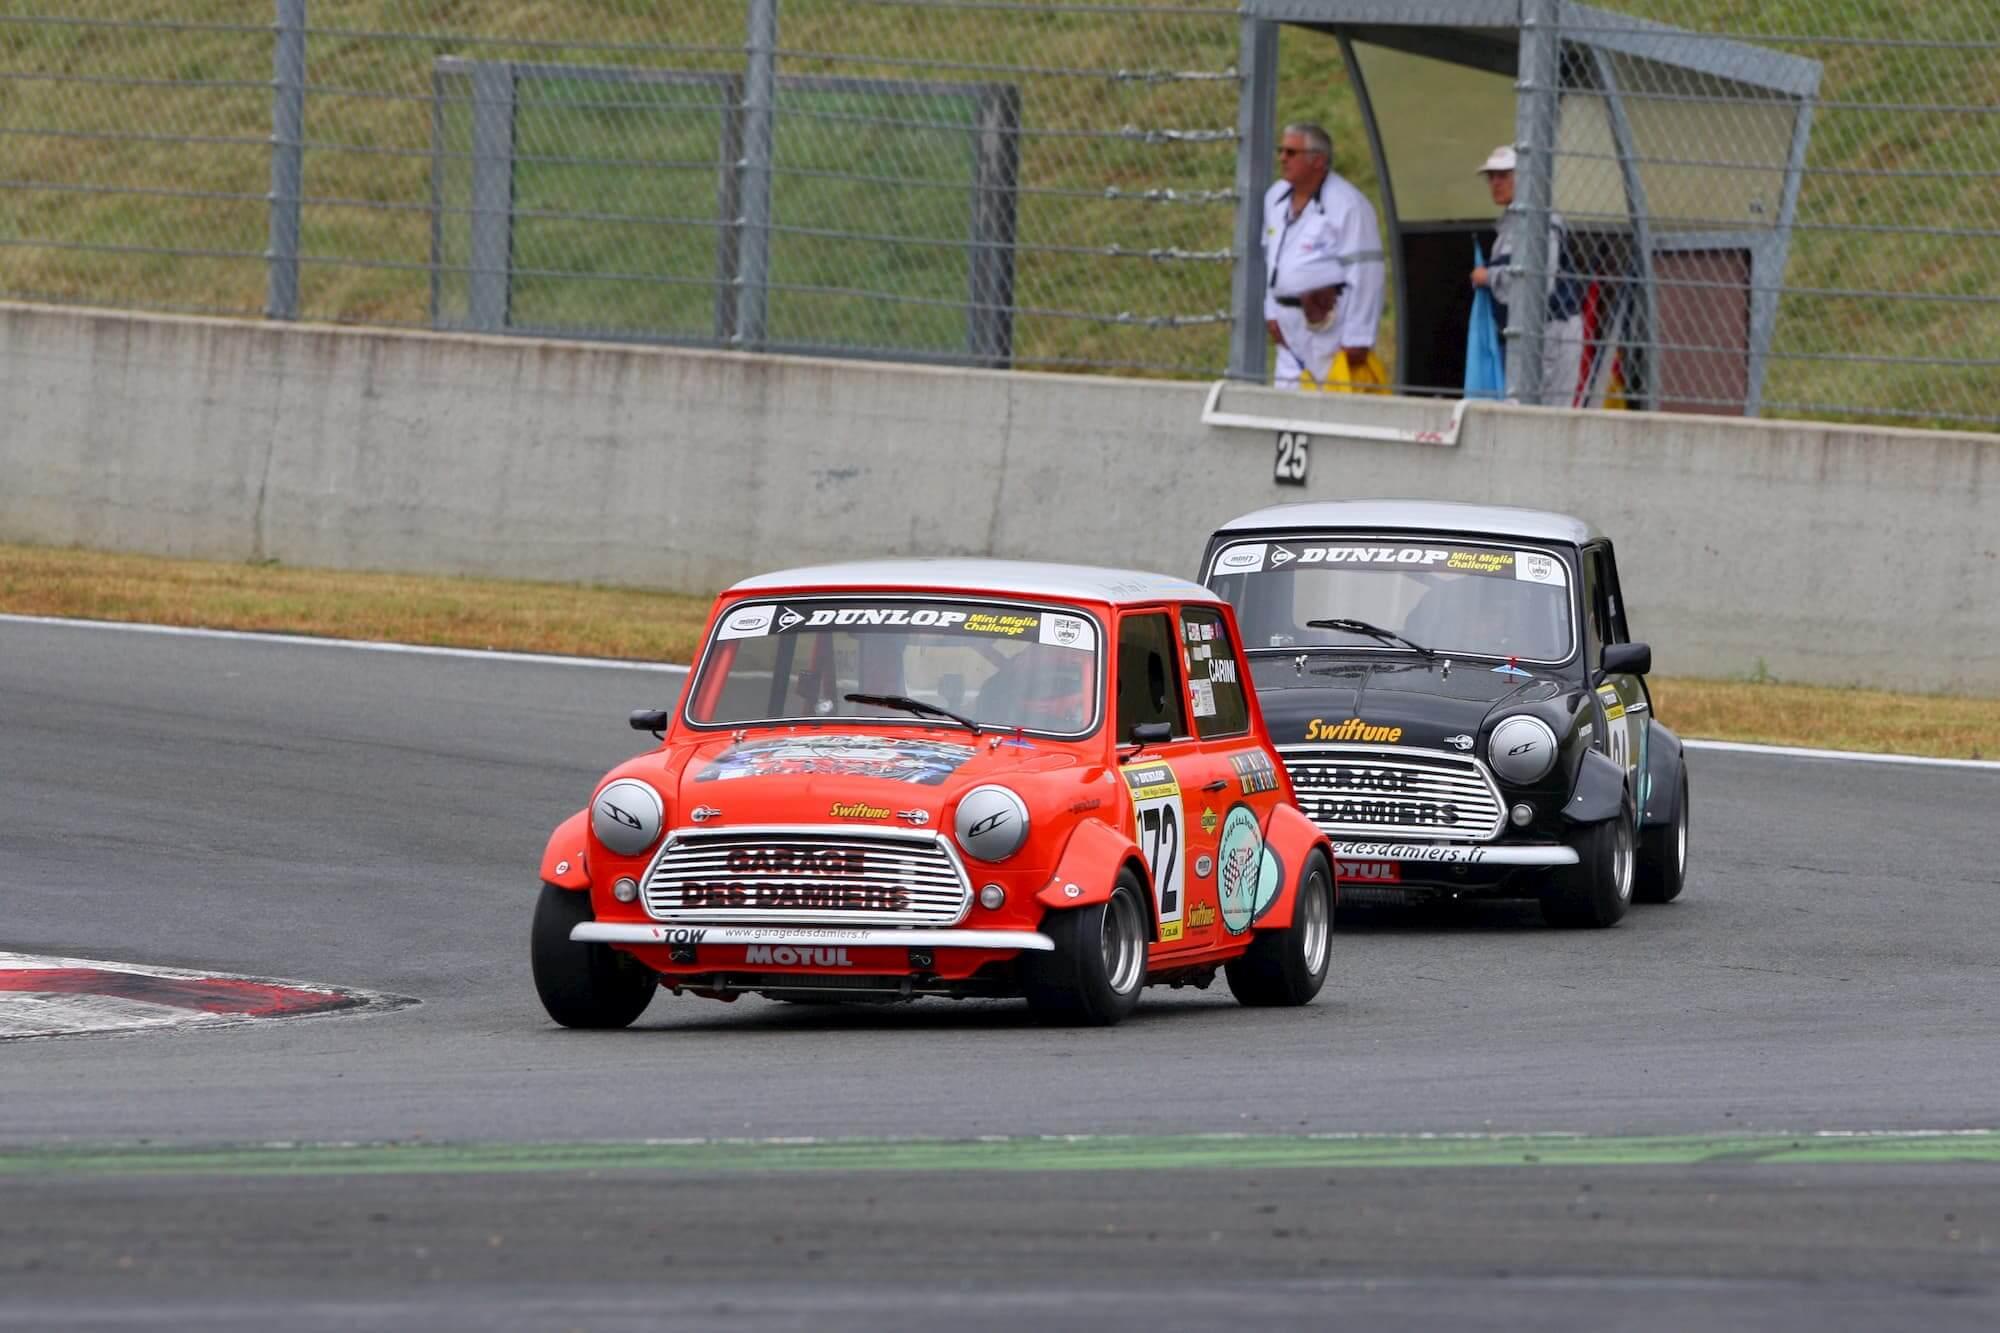 Mini austin - voiture ancienne - car racing